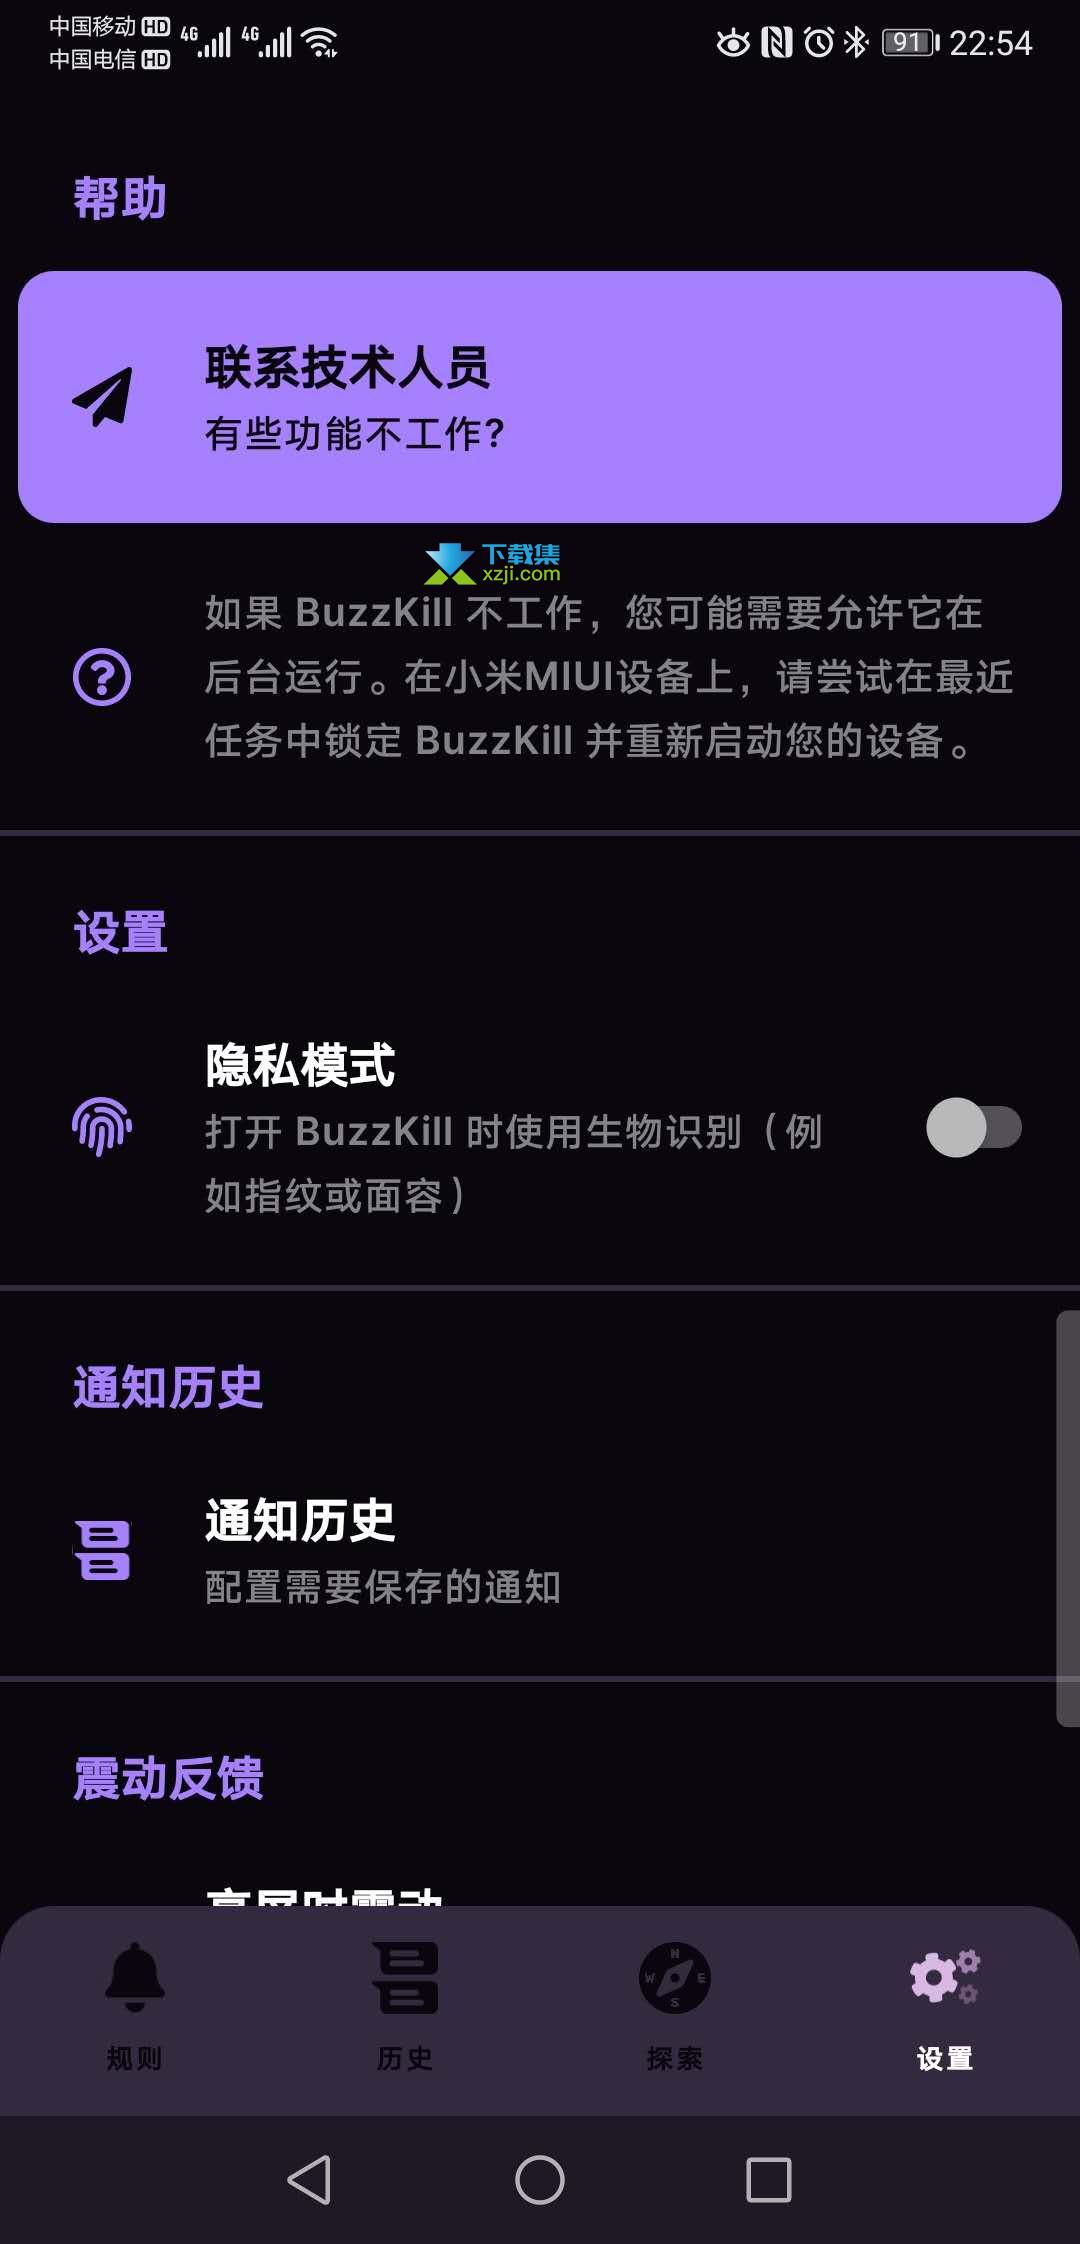 BuzzKill界面2